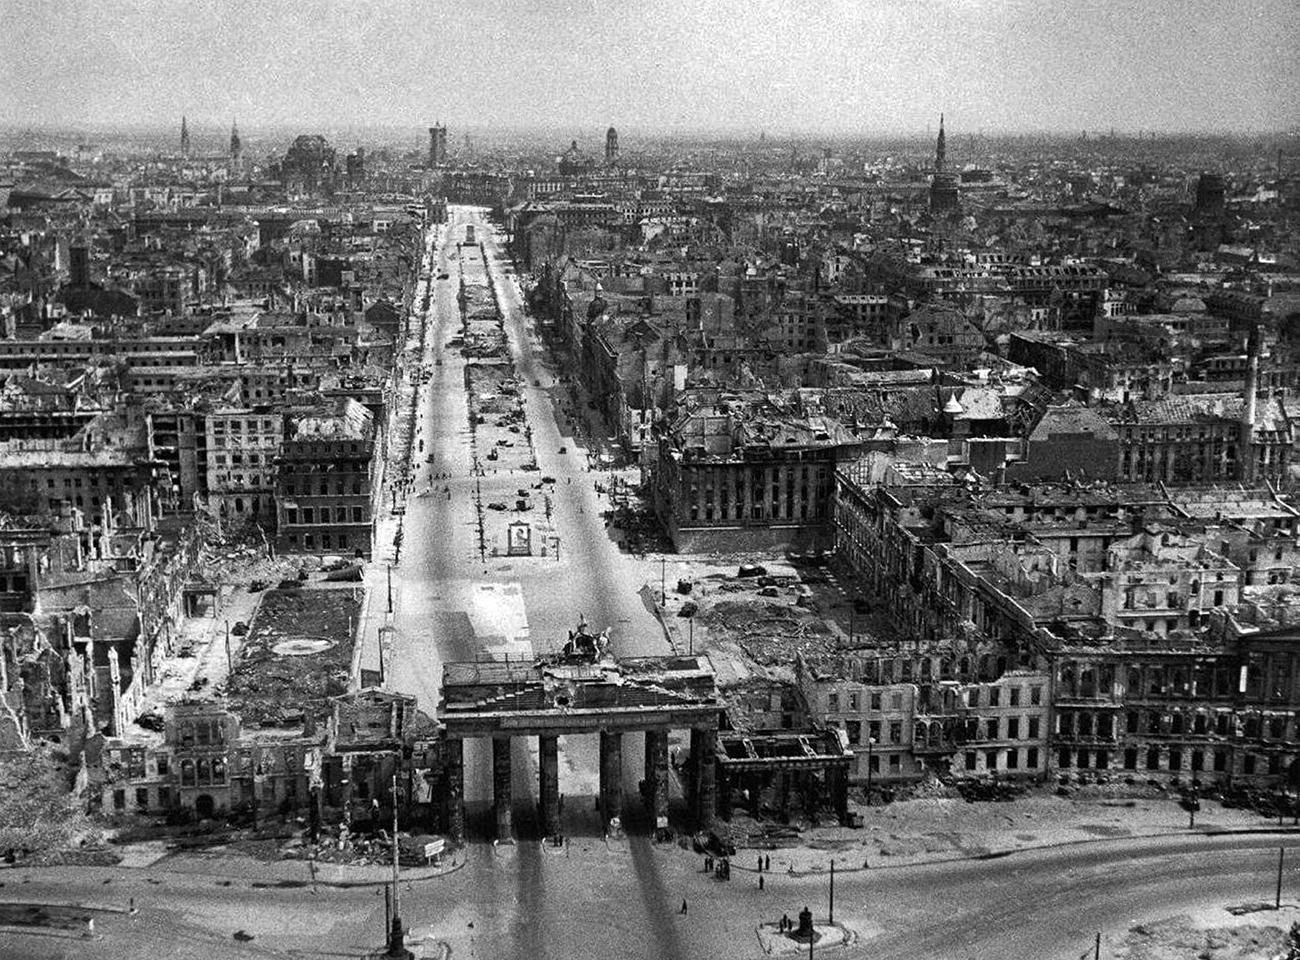 Berlin, the end of the World War II. / Photo: Global Look Press